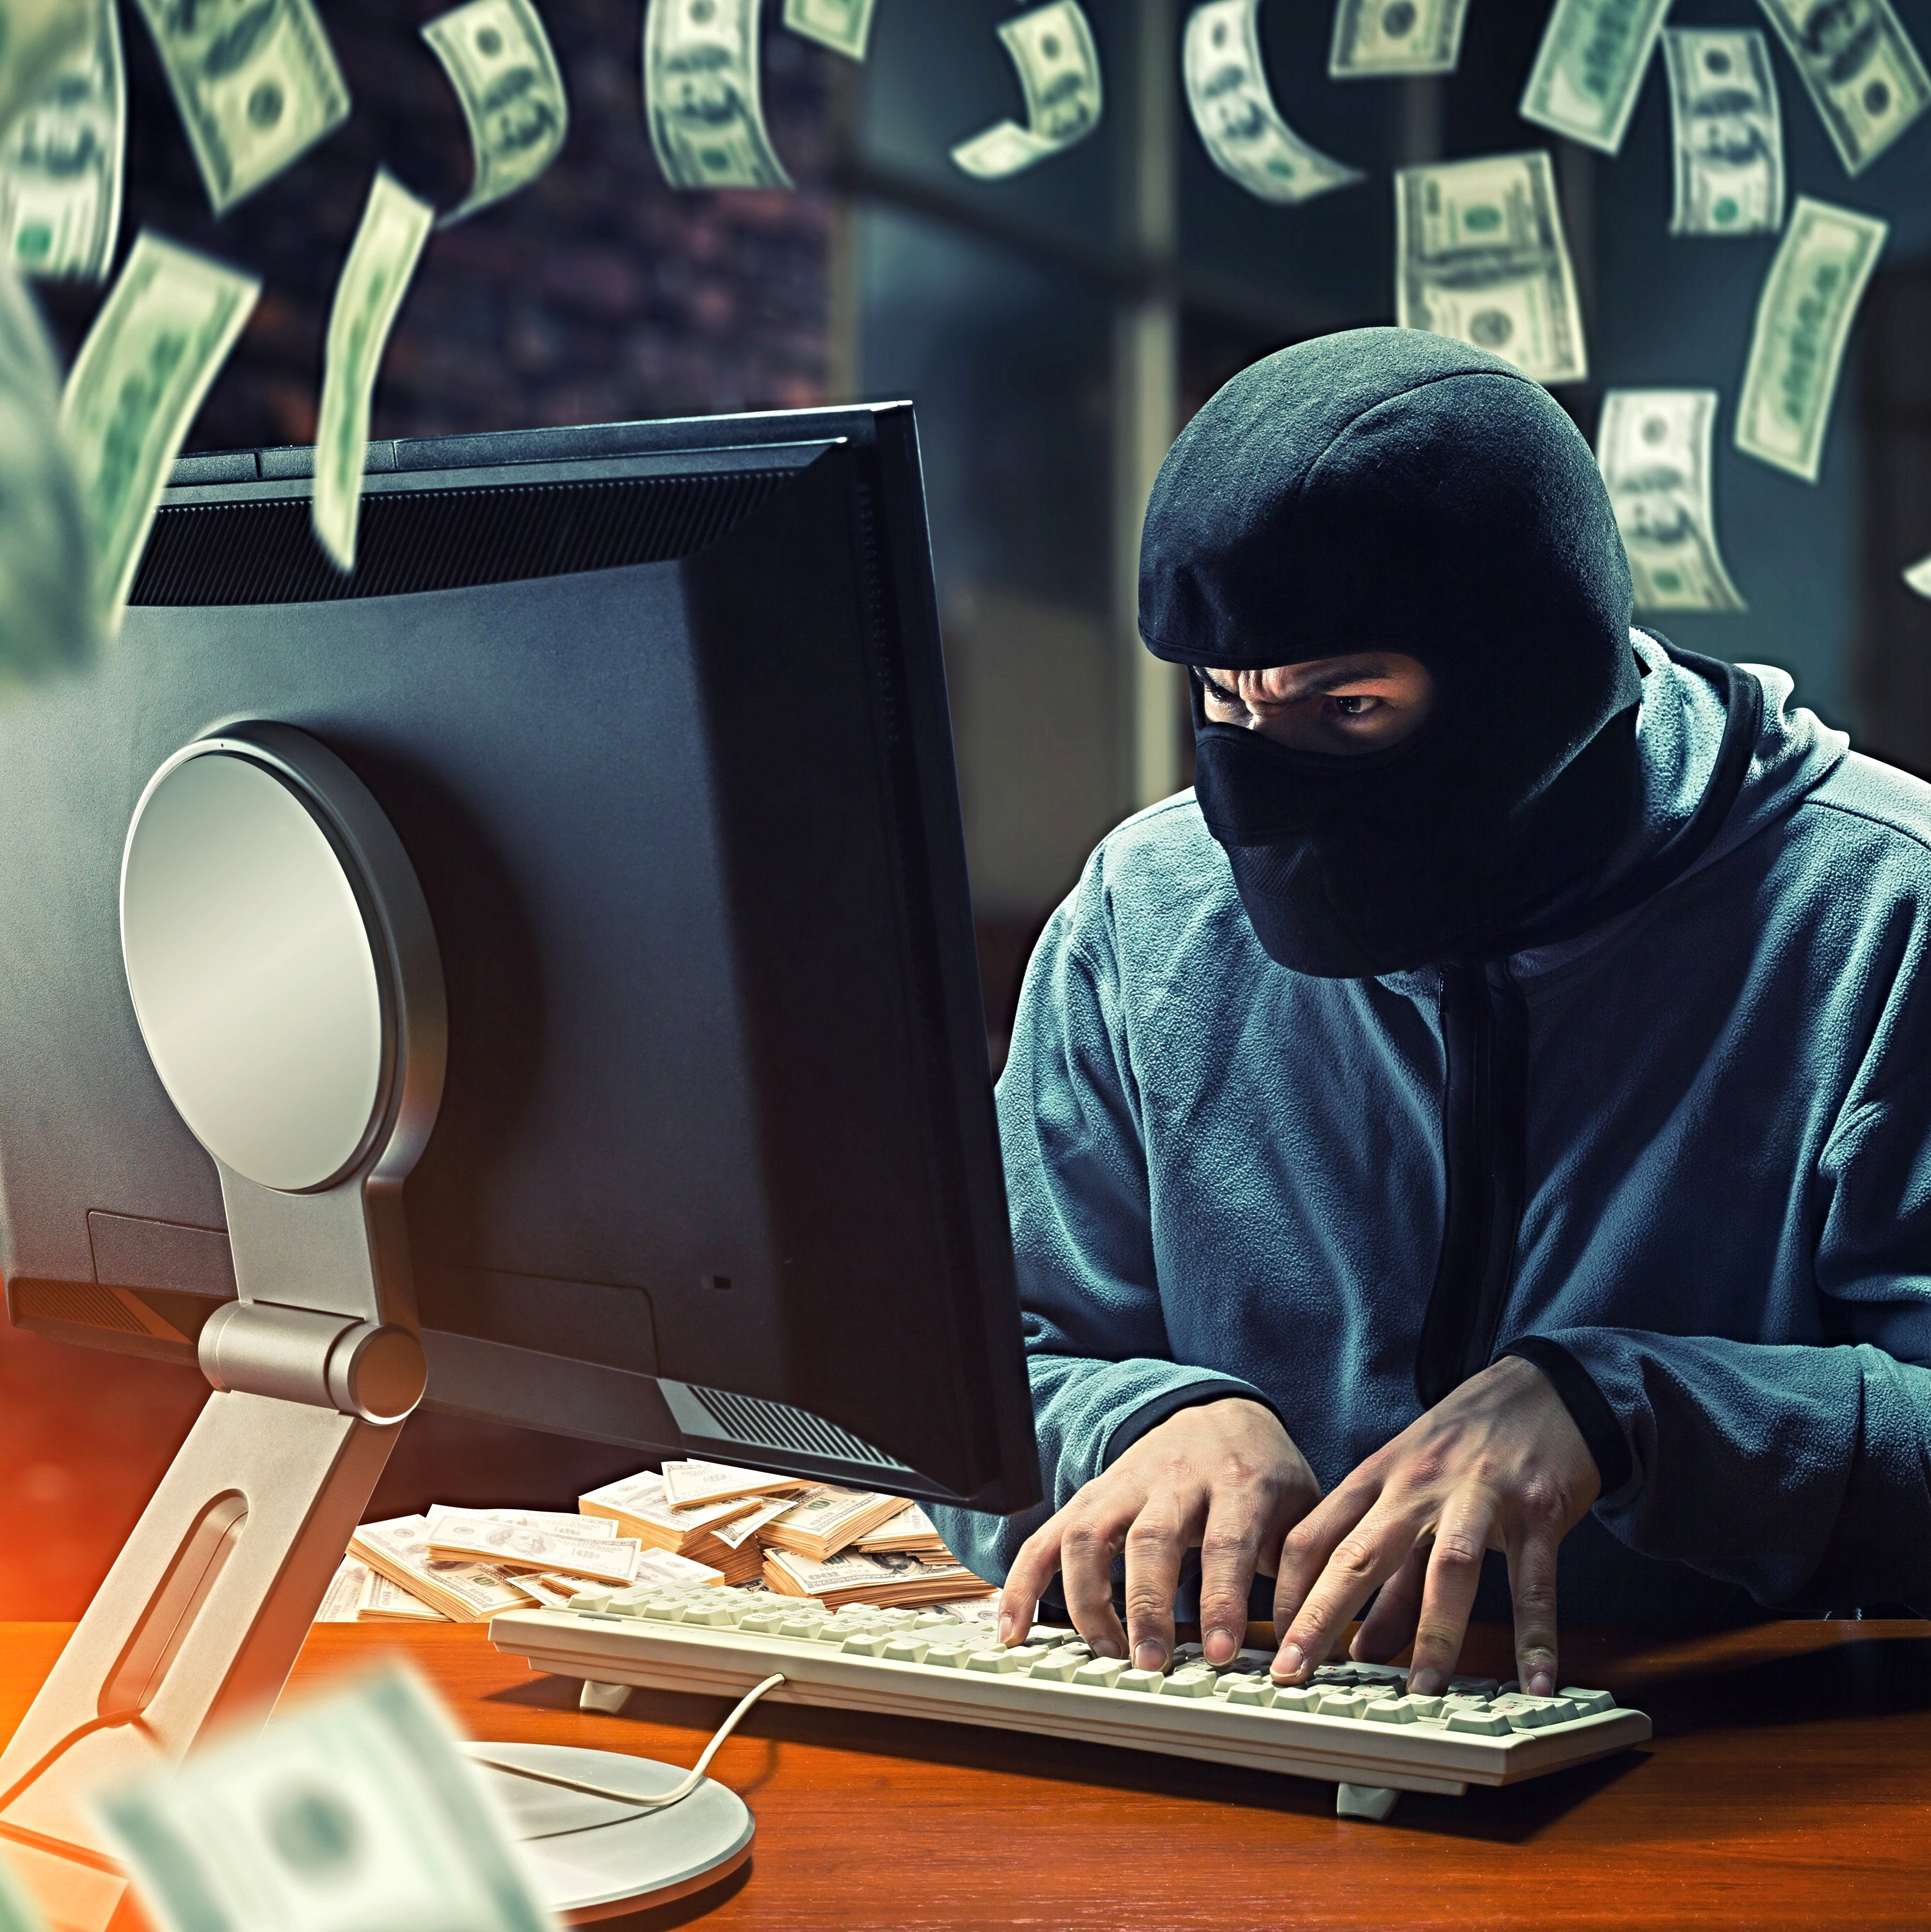 hacker_cash_money-computer black hood.jpeg